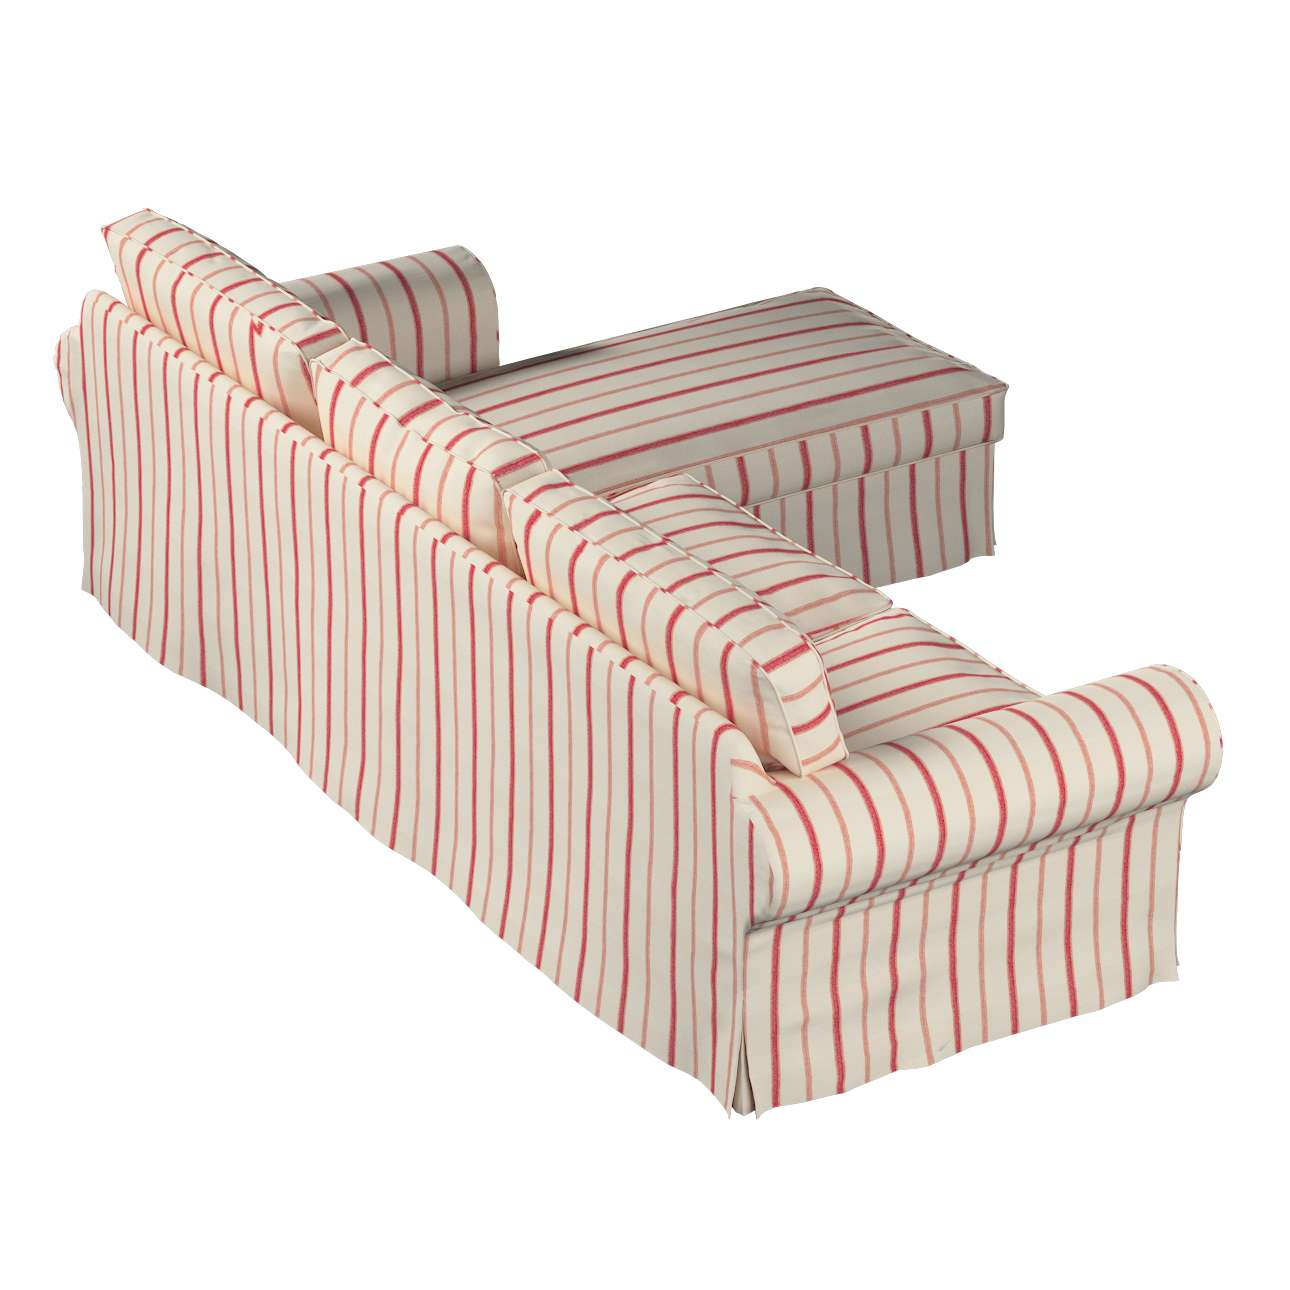 Ektorp 2-Sitzer Sofabezug mit Recamiere Ektorp 2-Sitzer Sofabezug mit Recamiere von der Kollektion Avinon, Stoff: 129-15